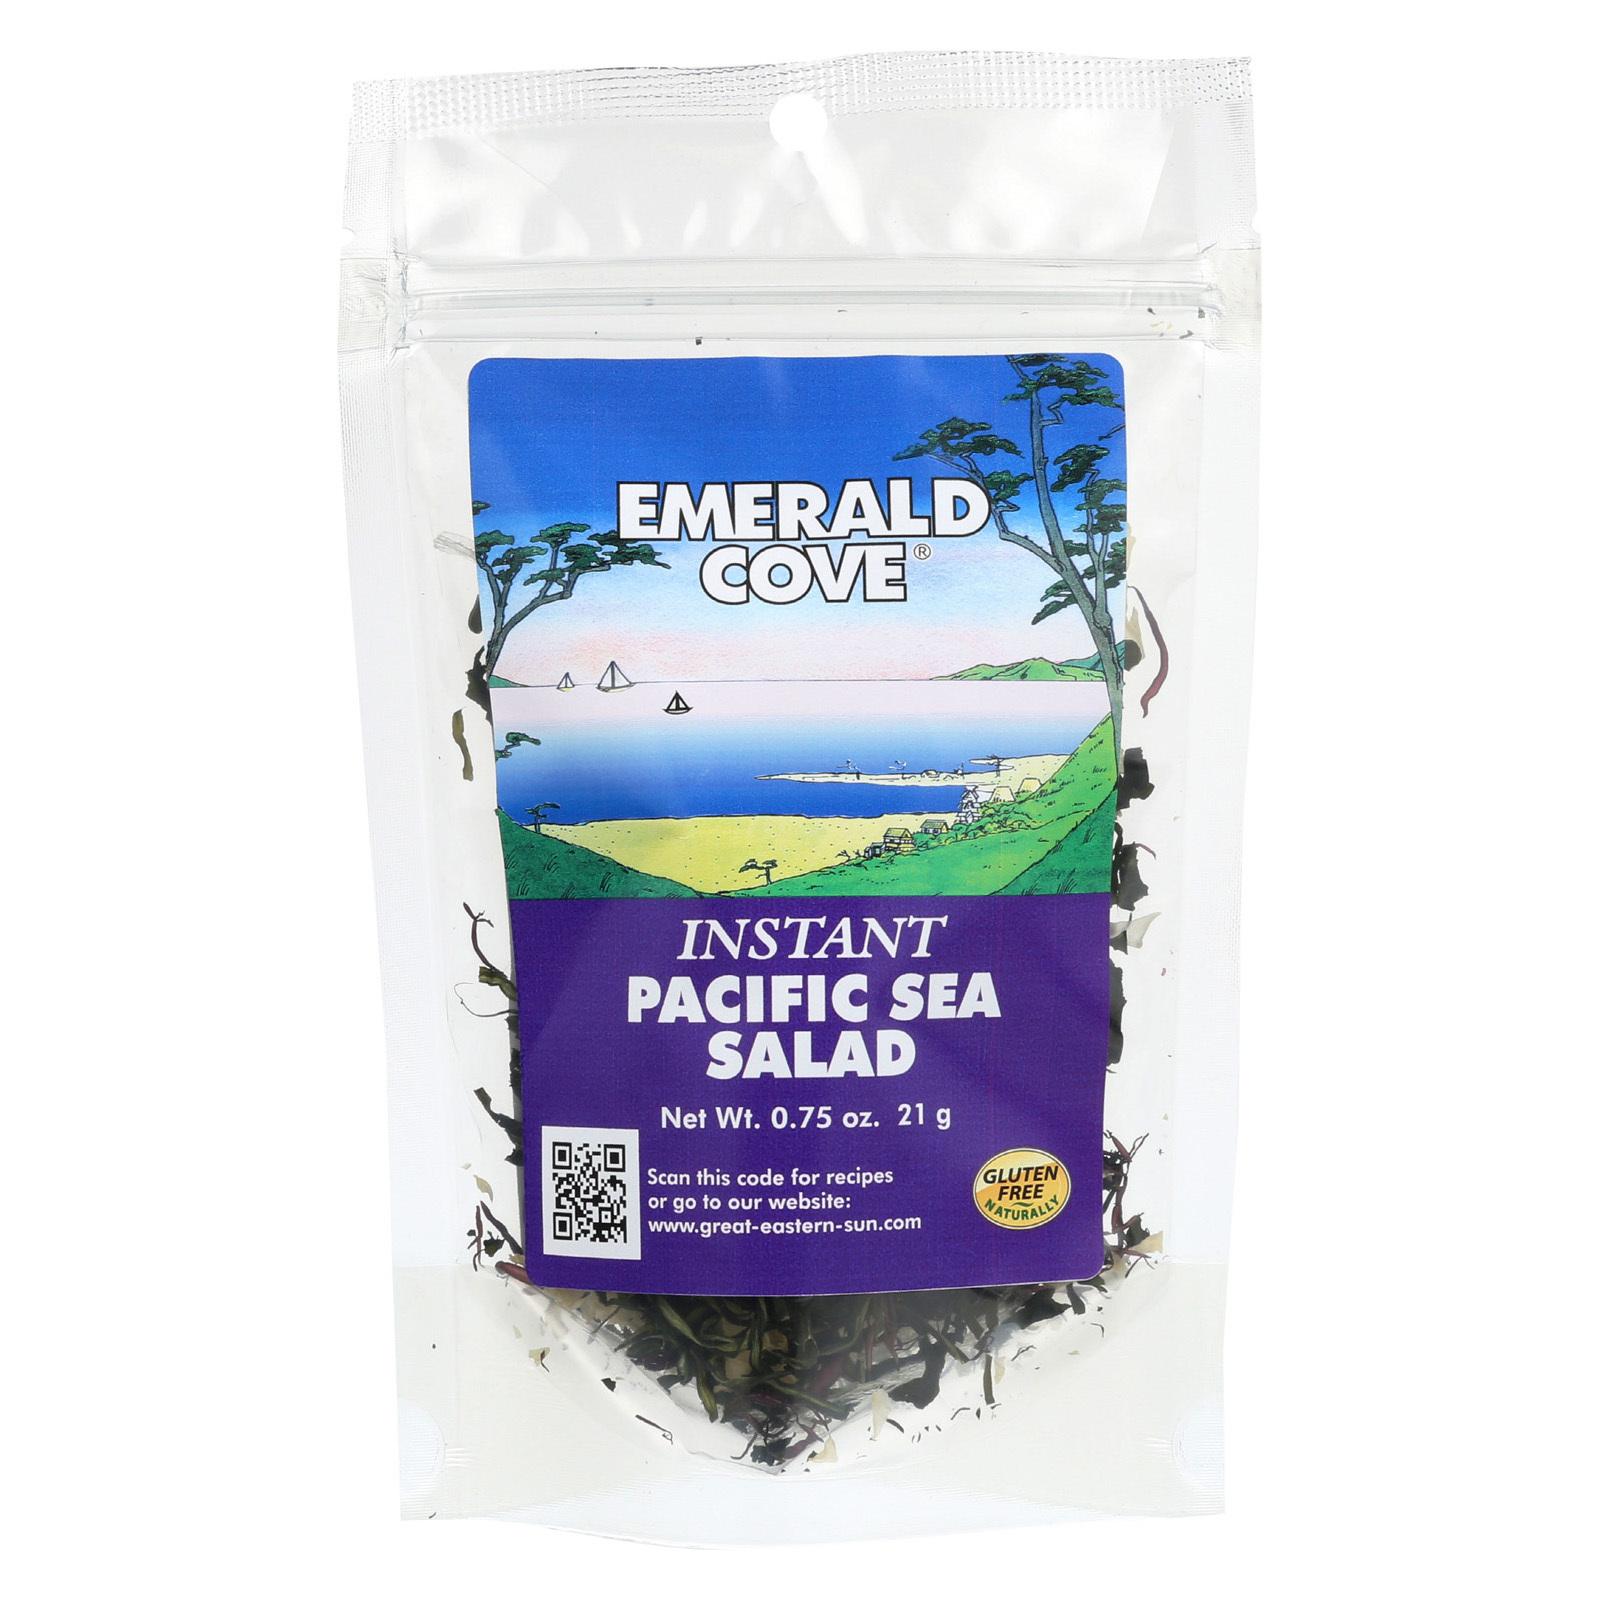 Emerald Cove Instant Pacific Sea Salad - Sea Vegetable - Case of 6 - .75 oz